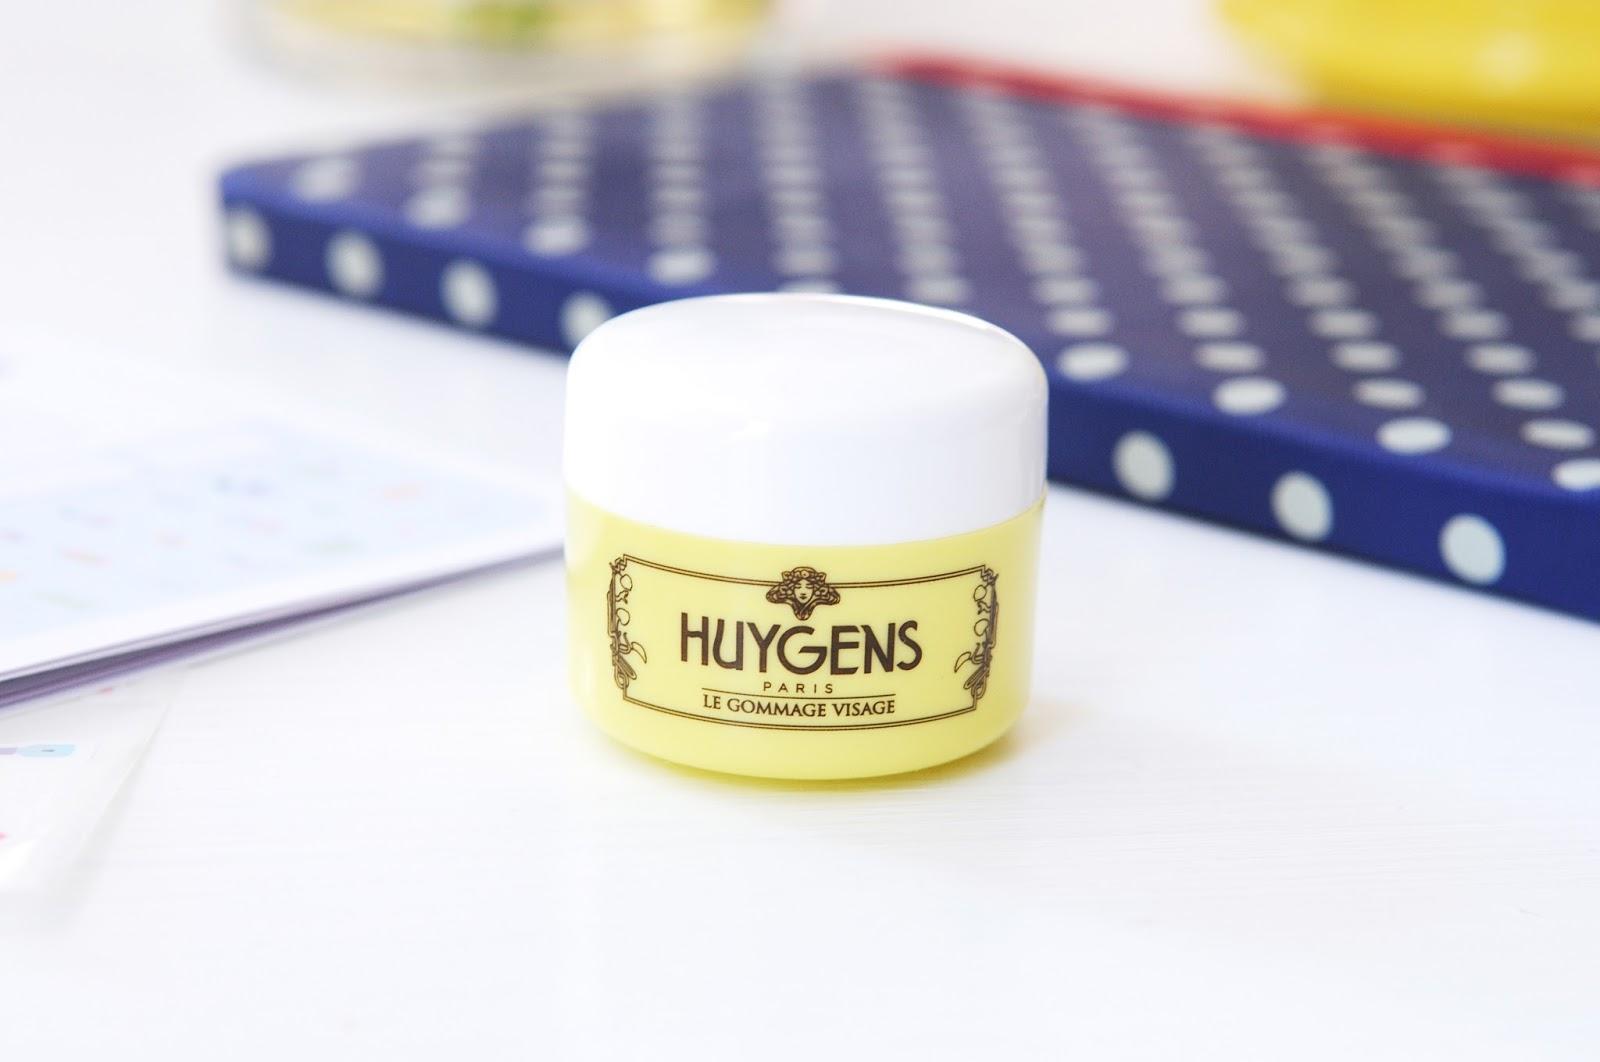 Huygens Le Gommage Visage